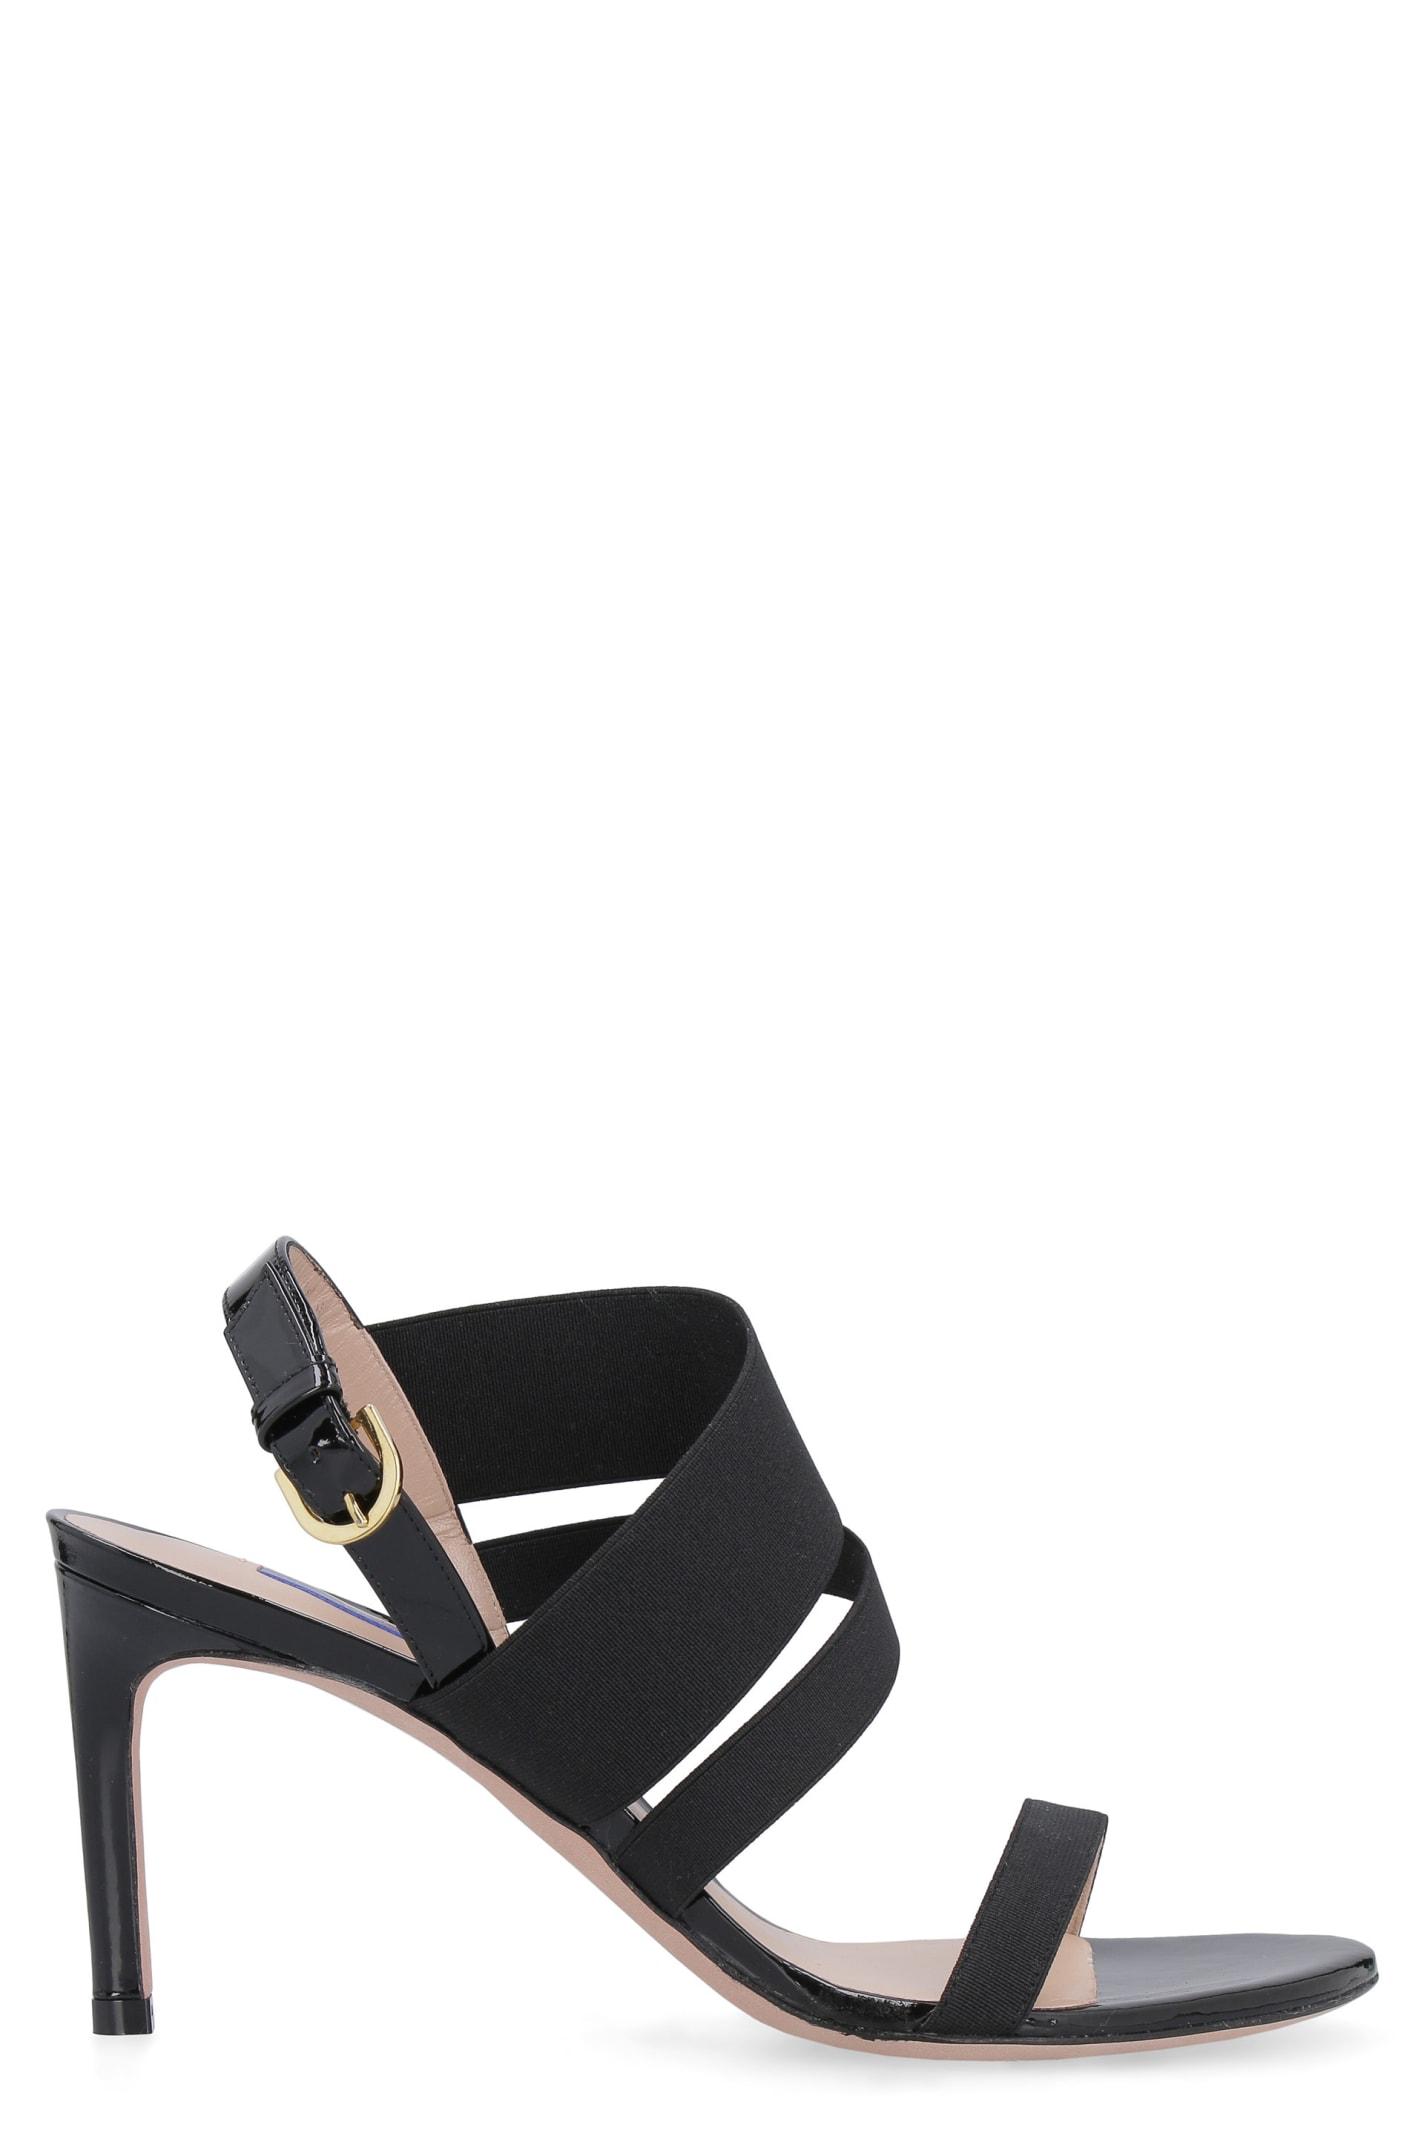 Buy Stuart Weitzman Adrienne Heel Sandals online, shop Stuart Weitzman shoes with free shipping